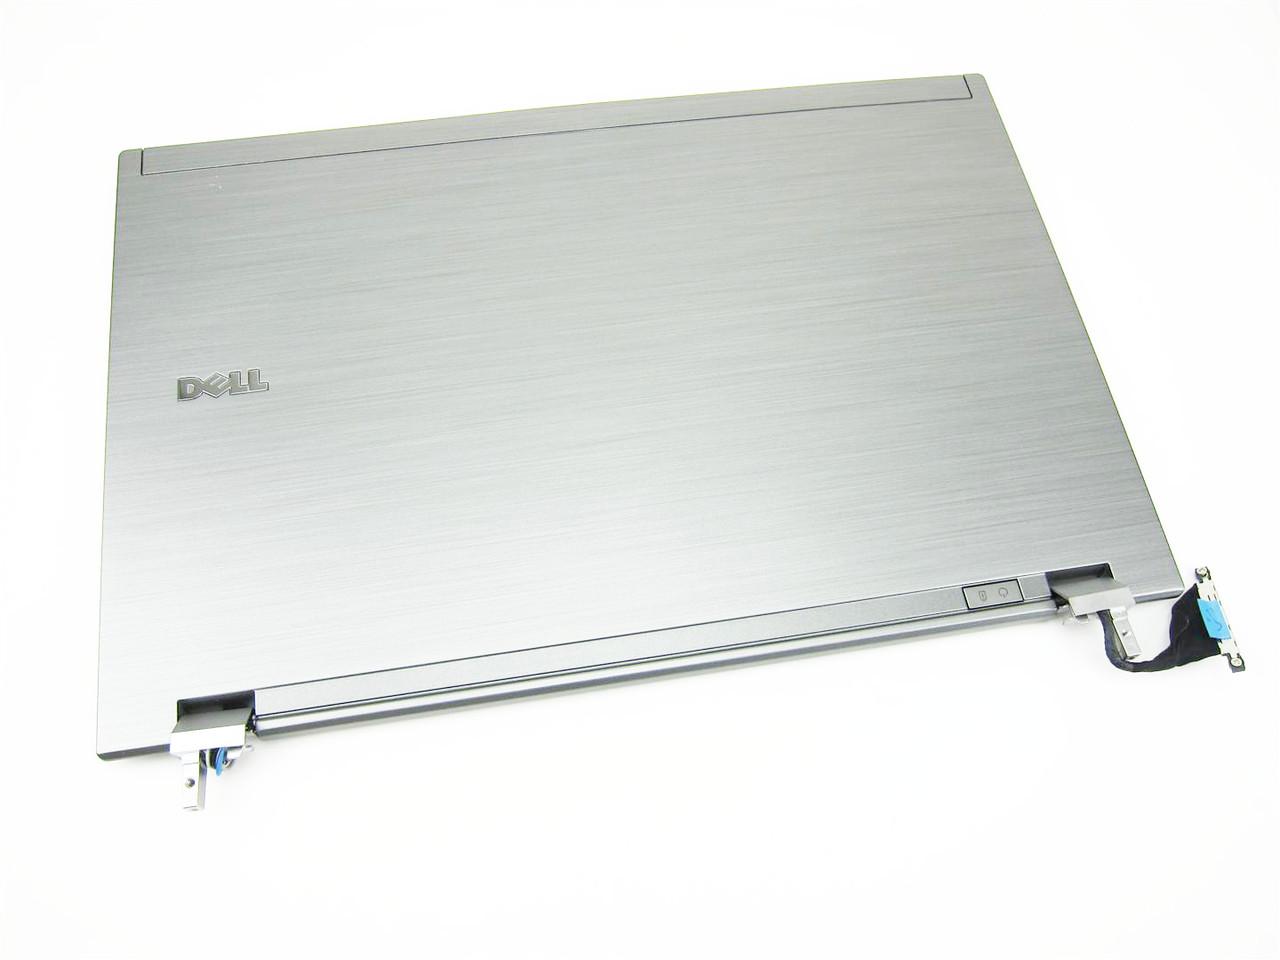 "Dell Latitude E4310 13.3"" LCD Back Cover Lid & Hinges - 1K9FR"